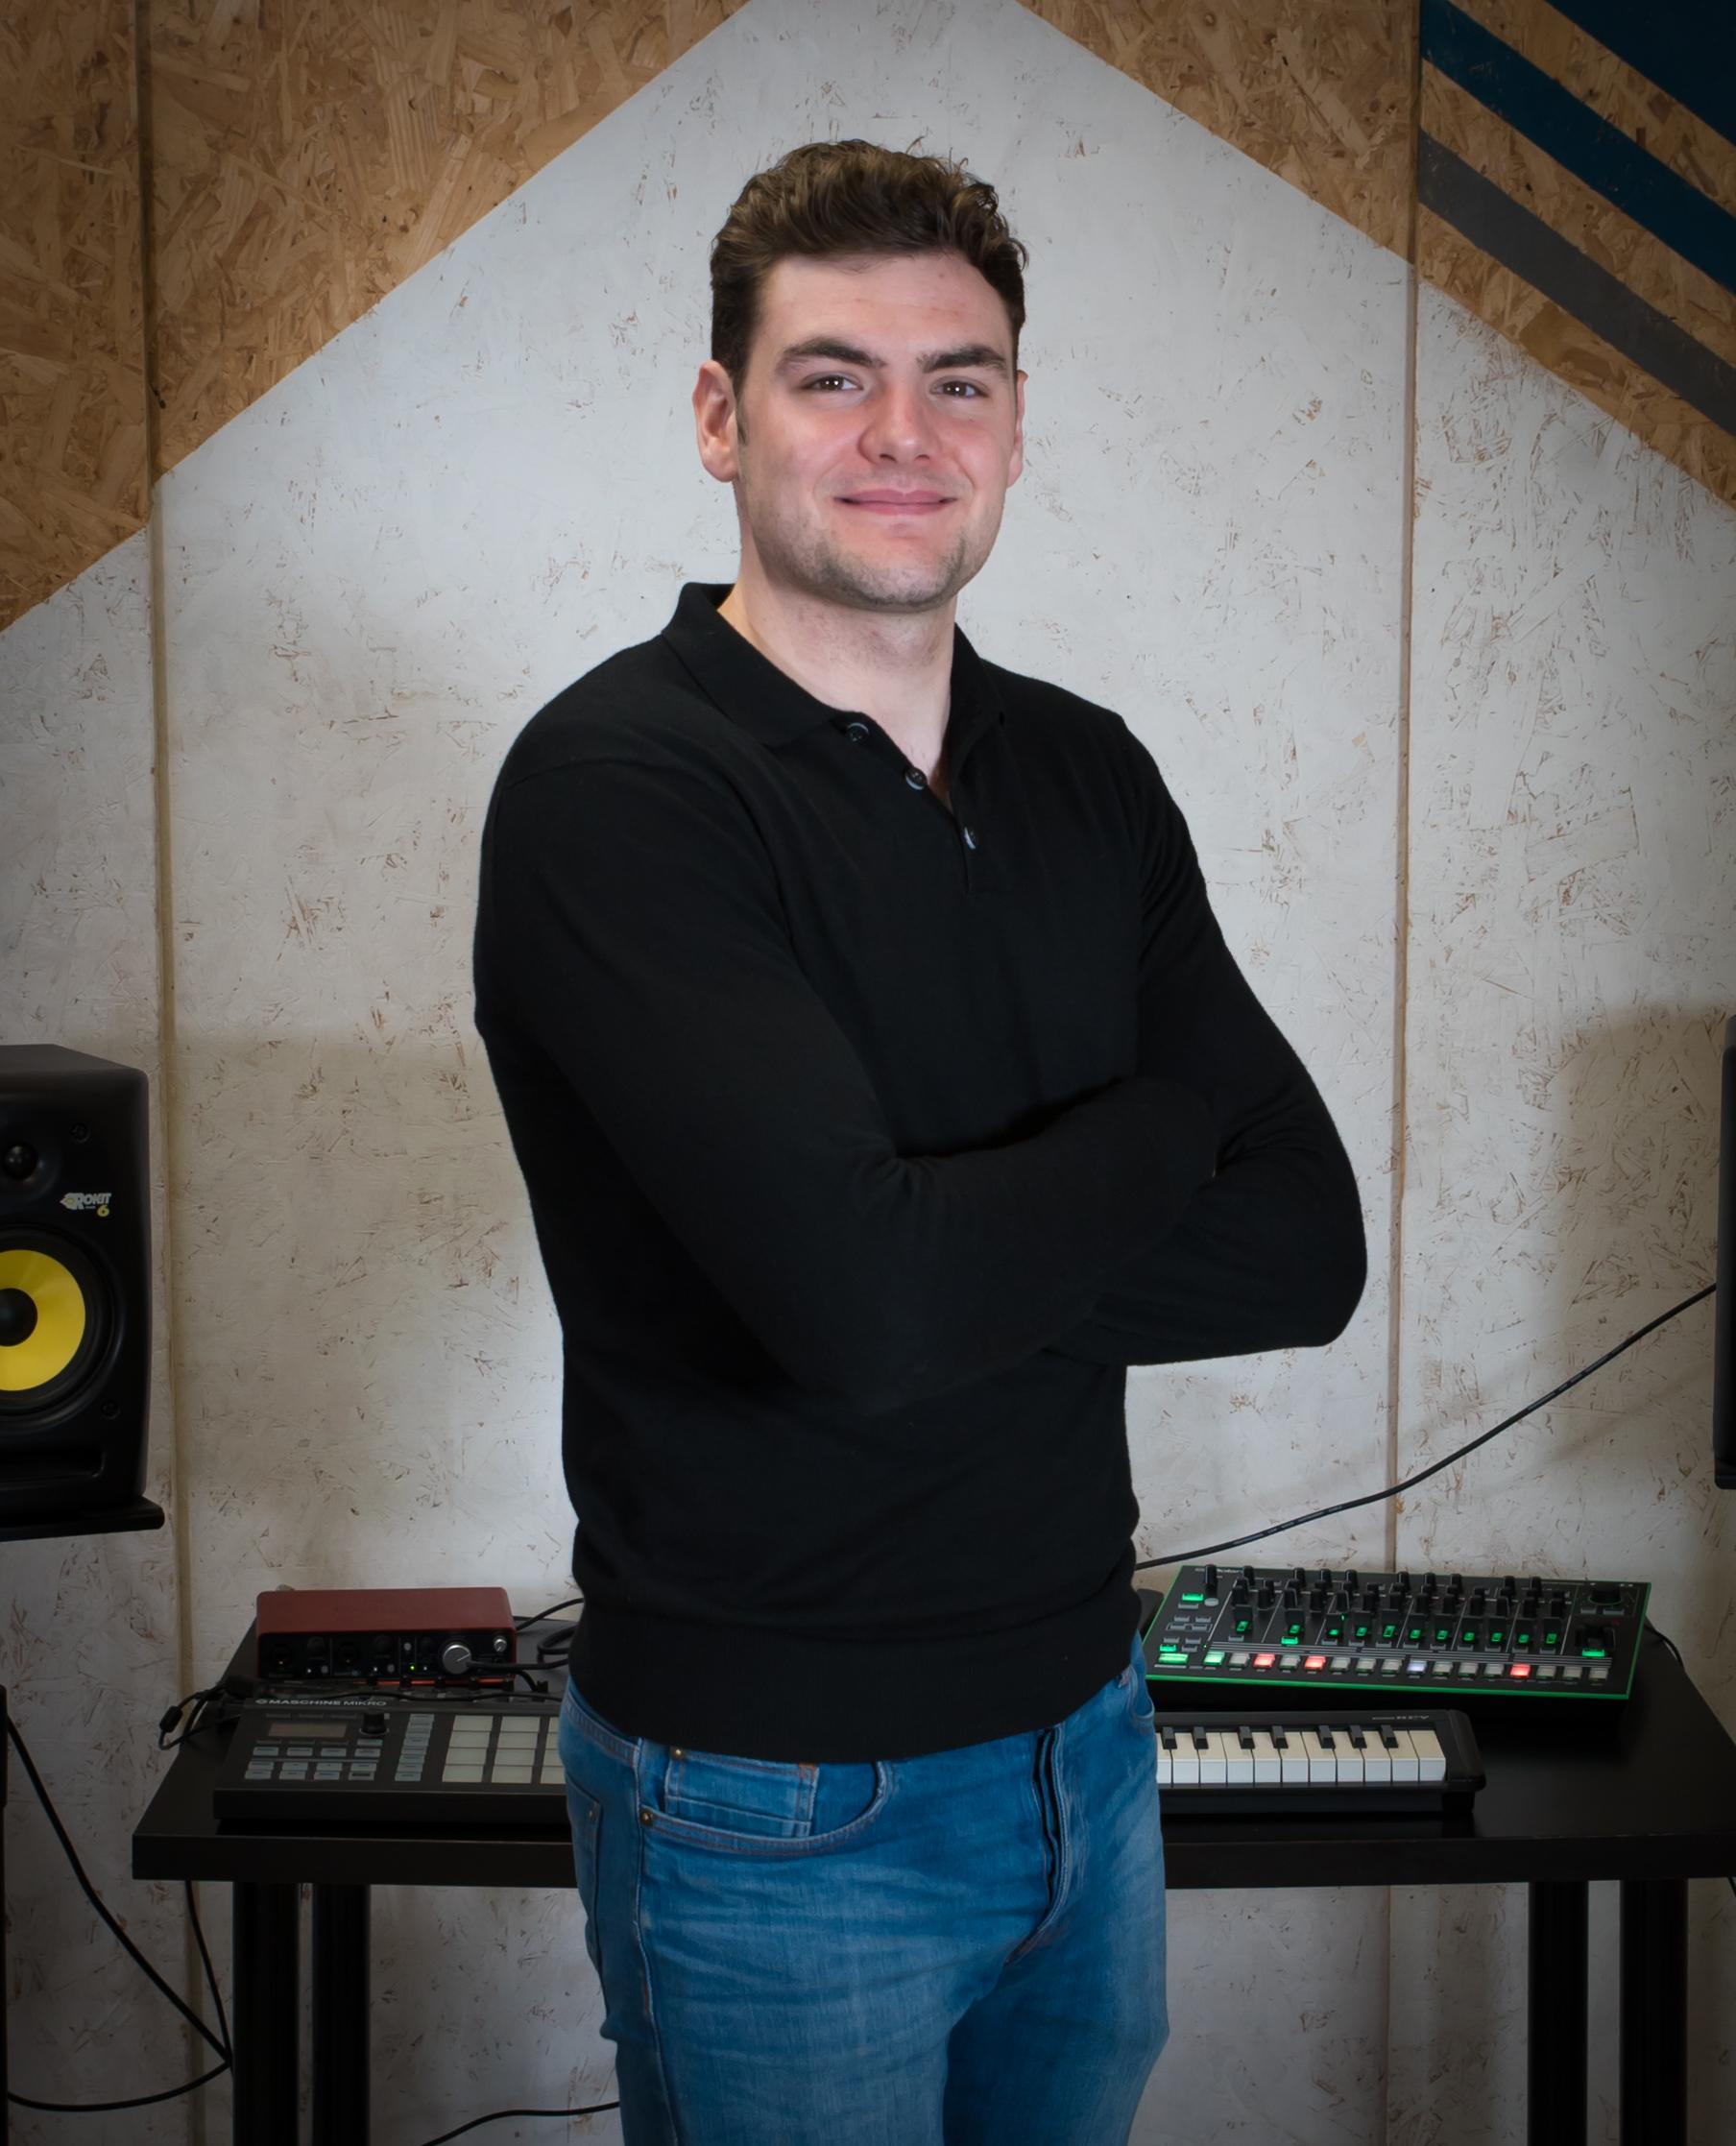 START MAKING MUSIC YOU LOVE  -